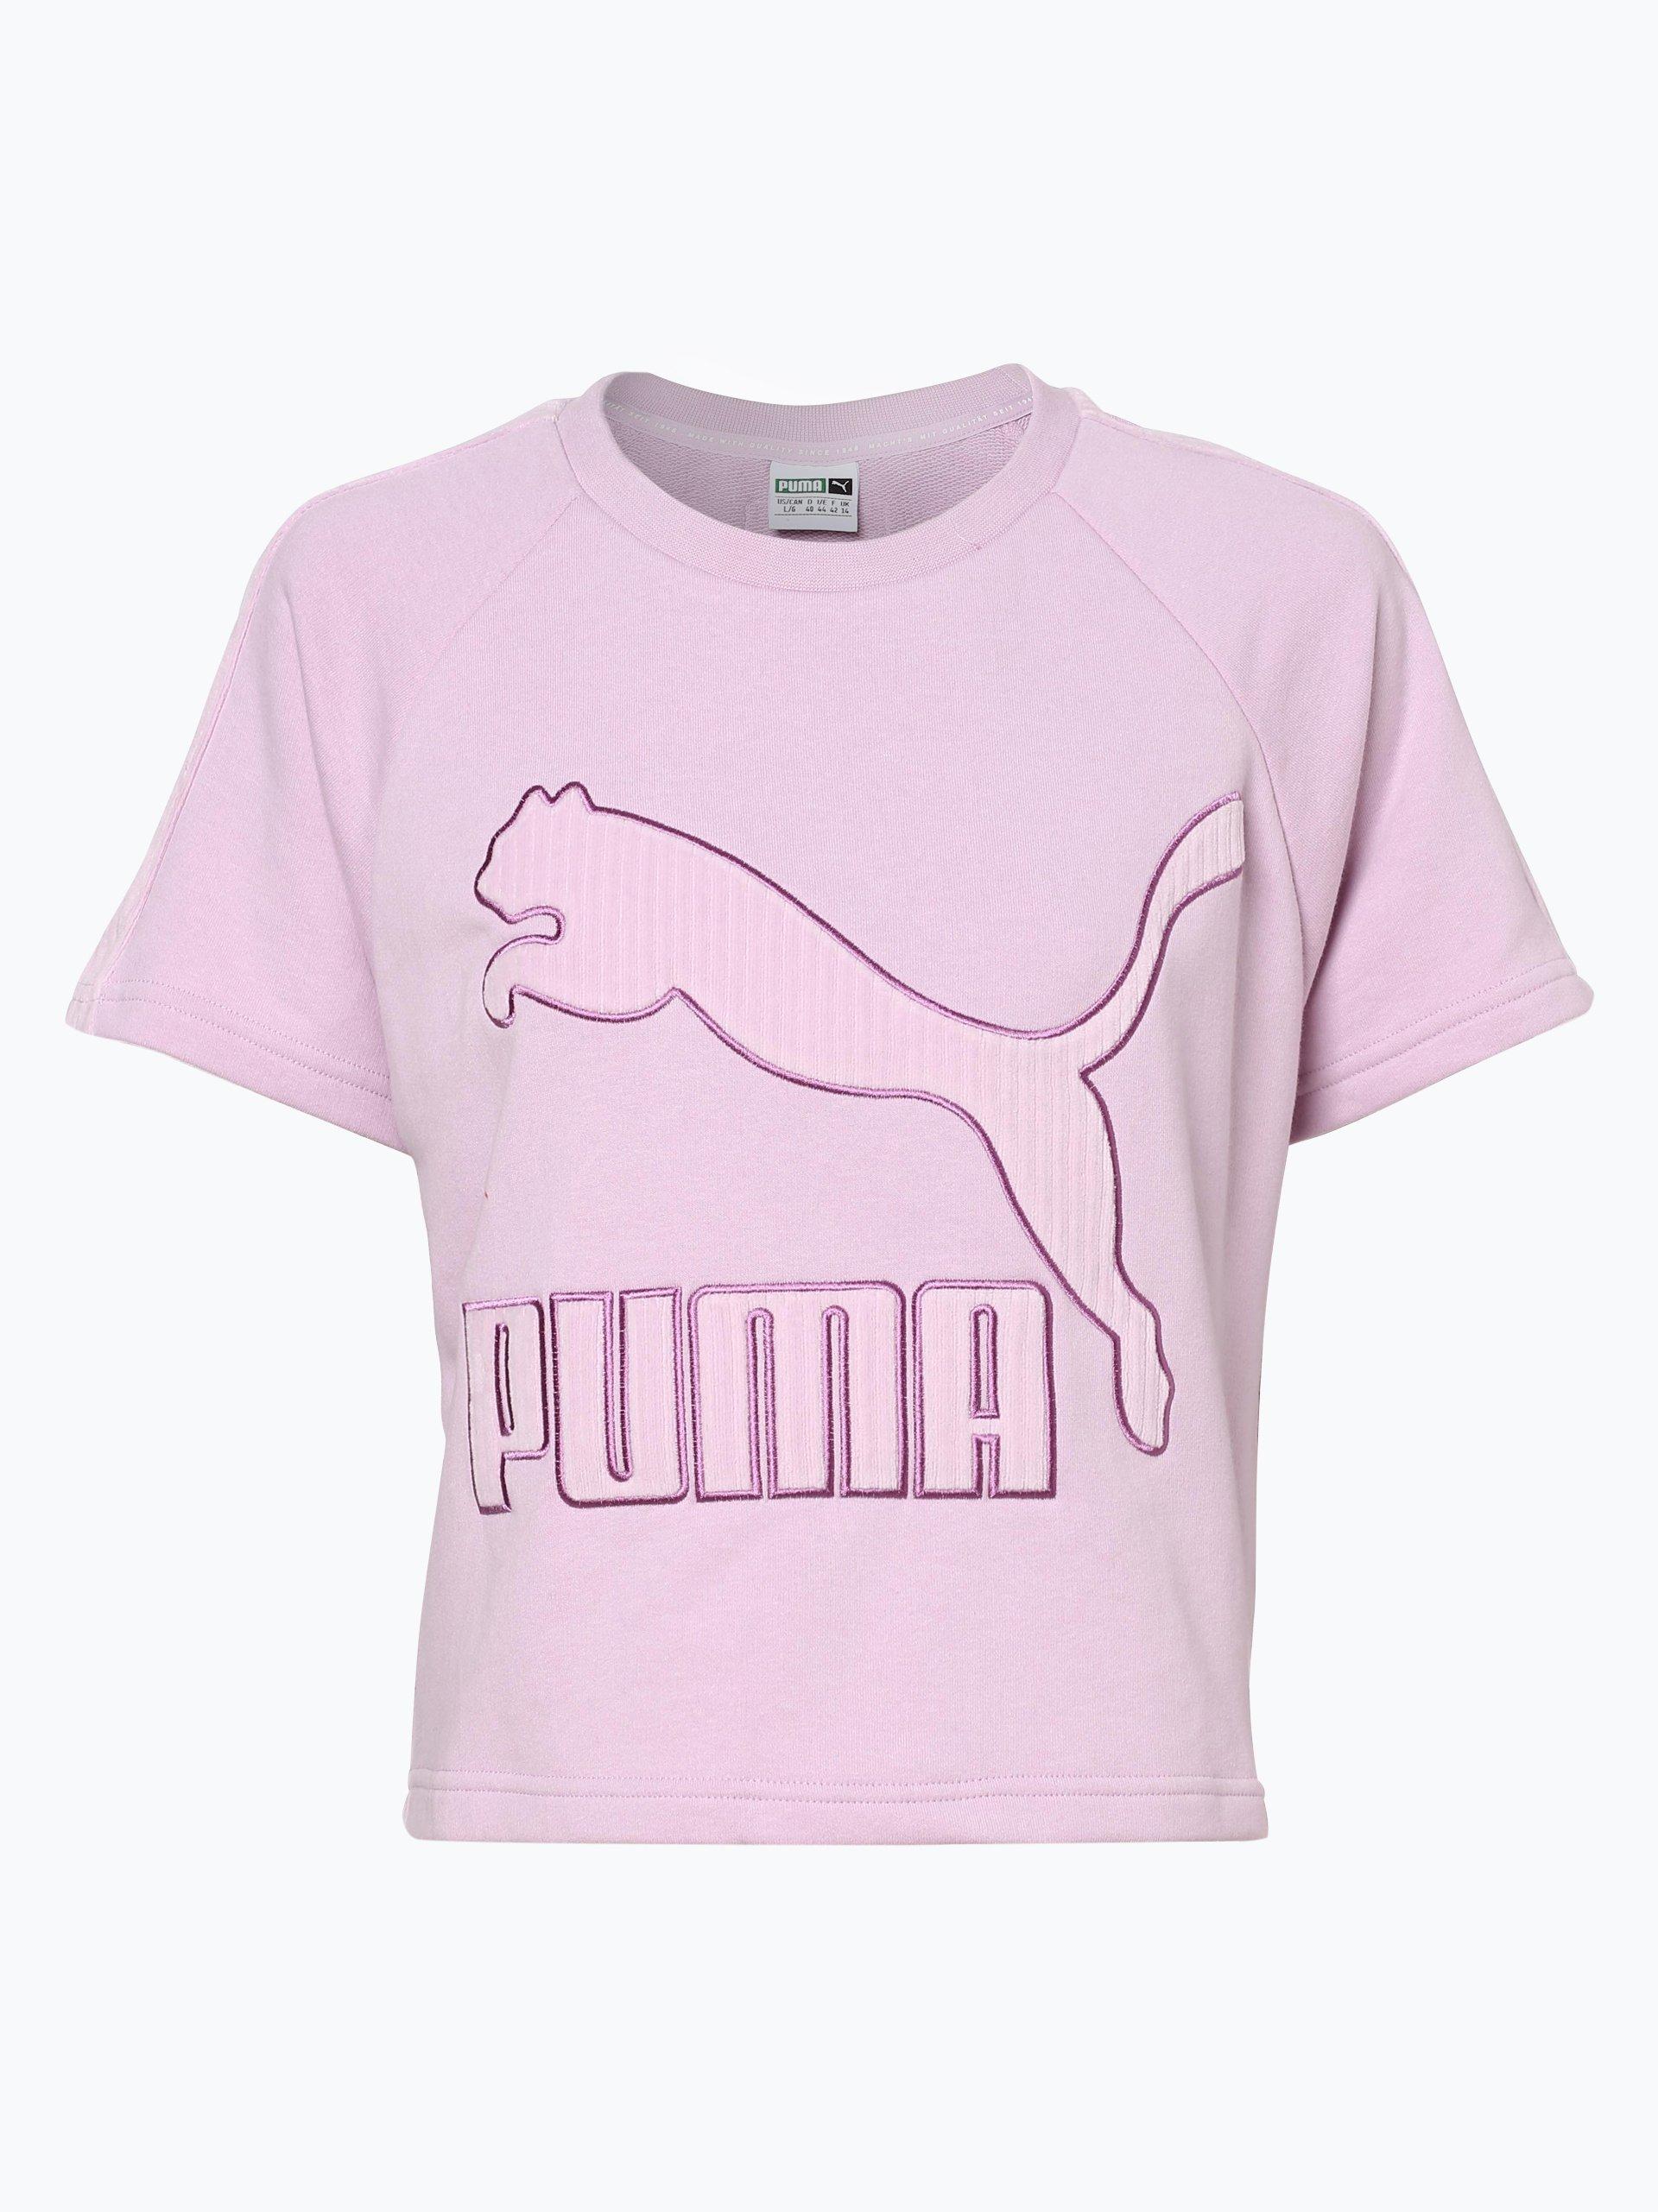 puma damen t shirt flieder bedruckt online kaufen vangraaf com. Black Bedroom Furniture Sets. Home Design Ideas